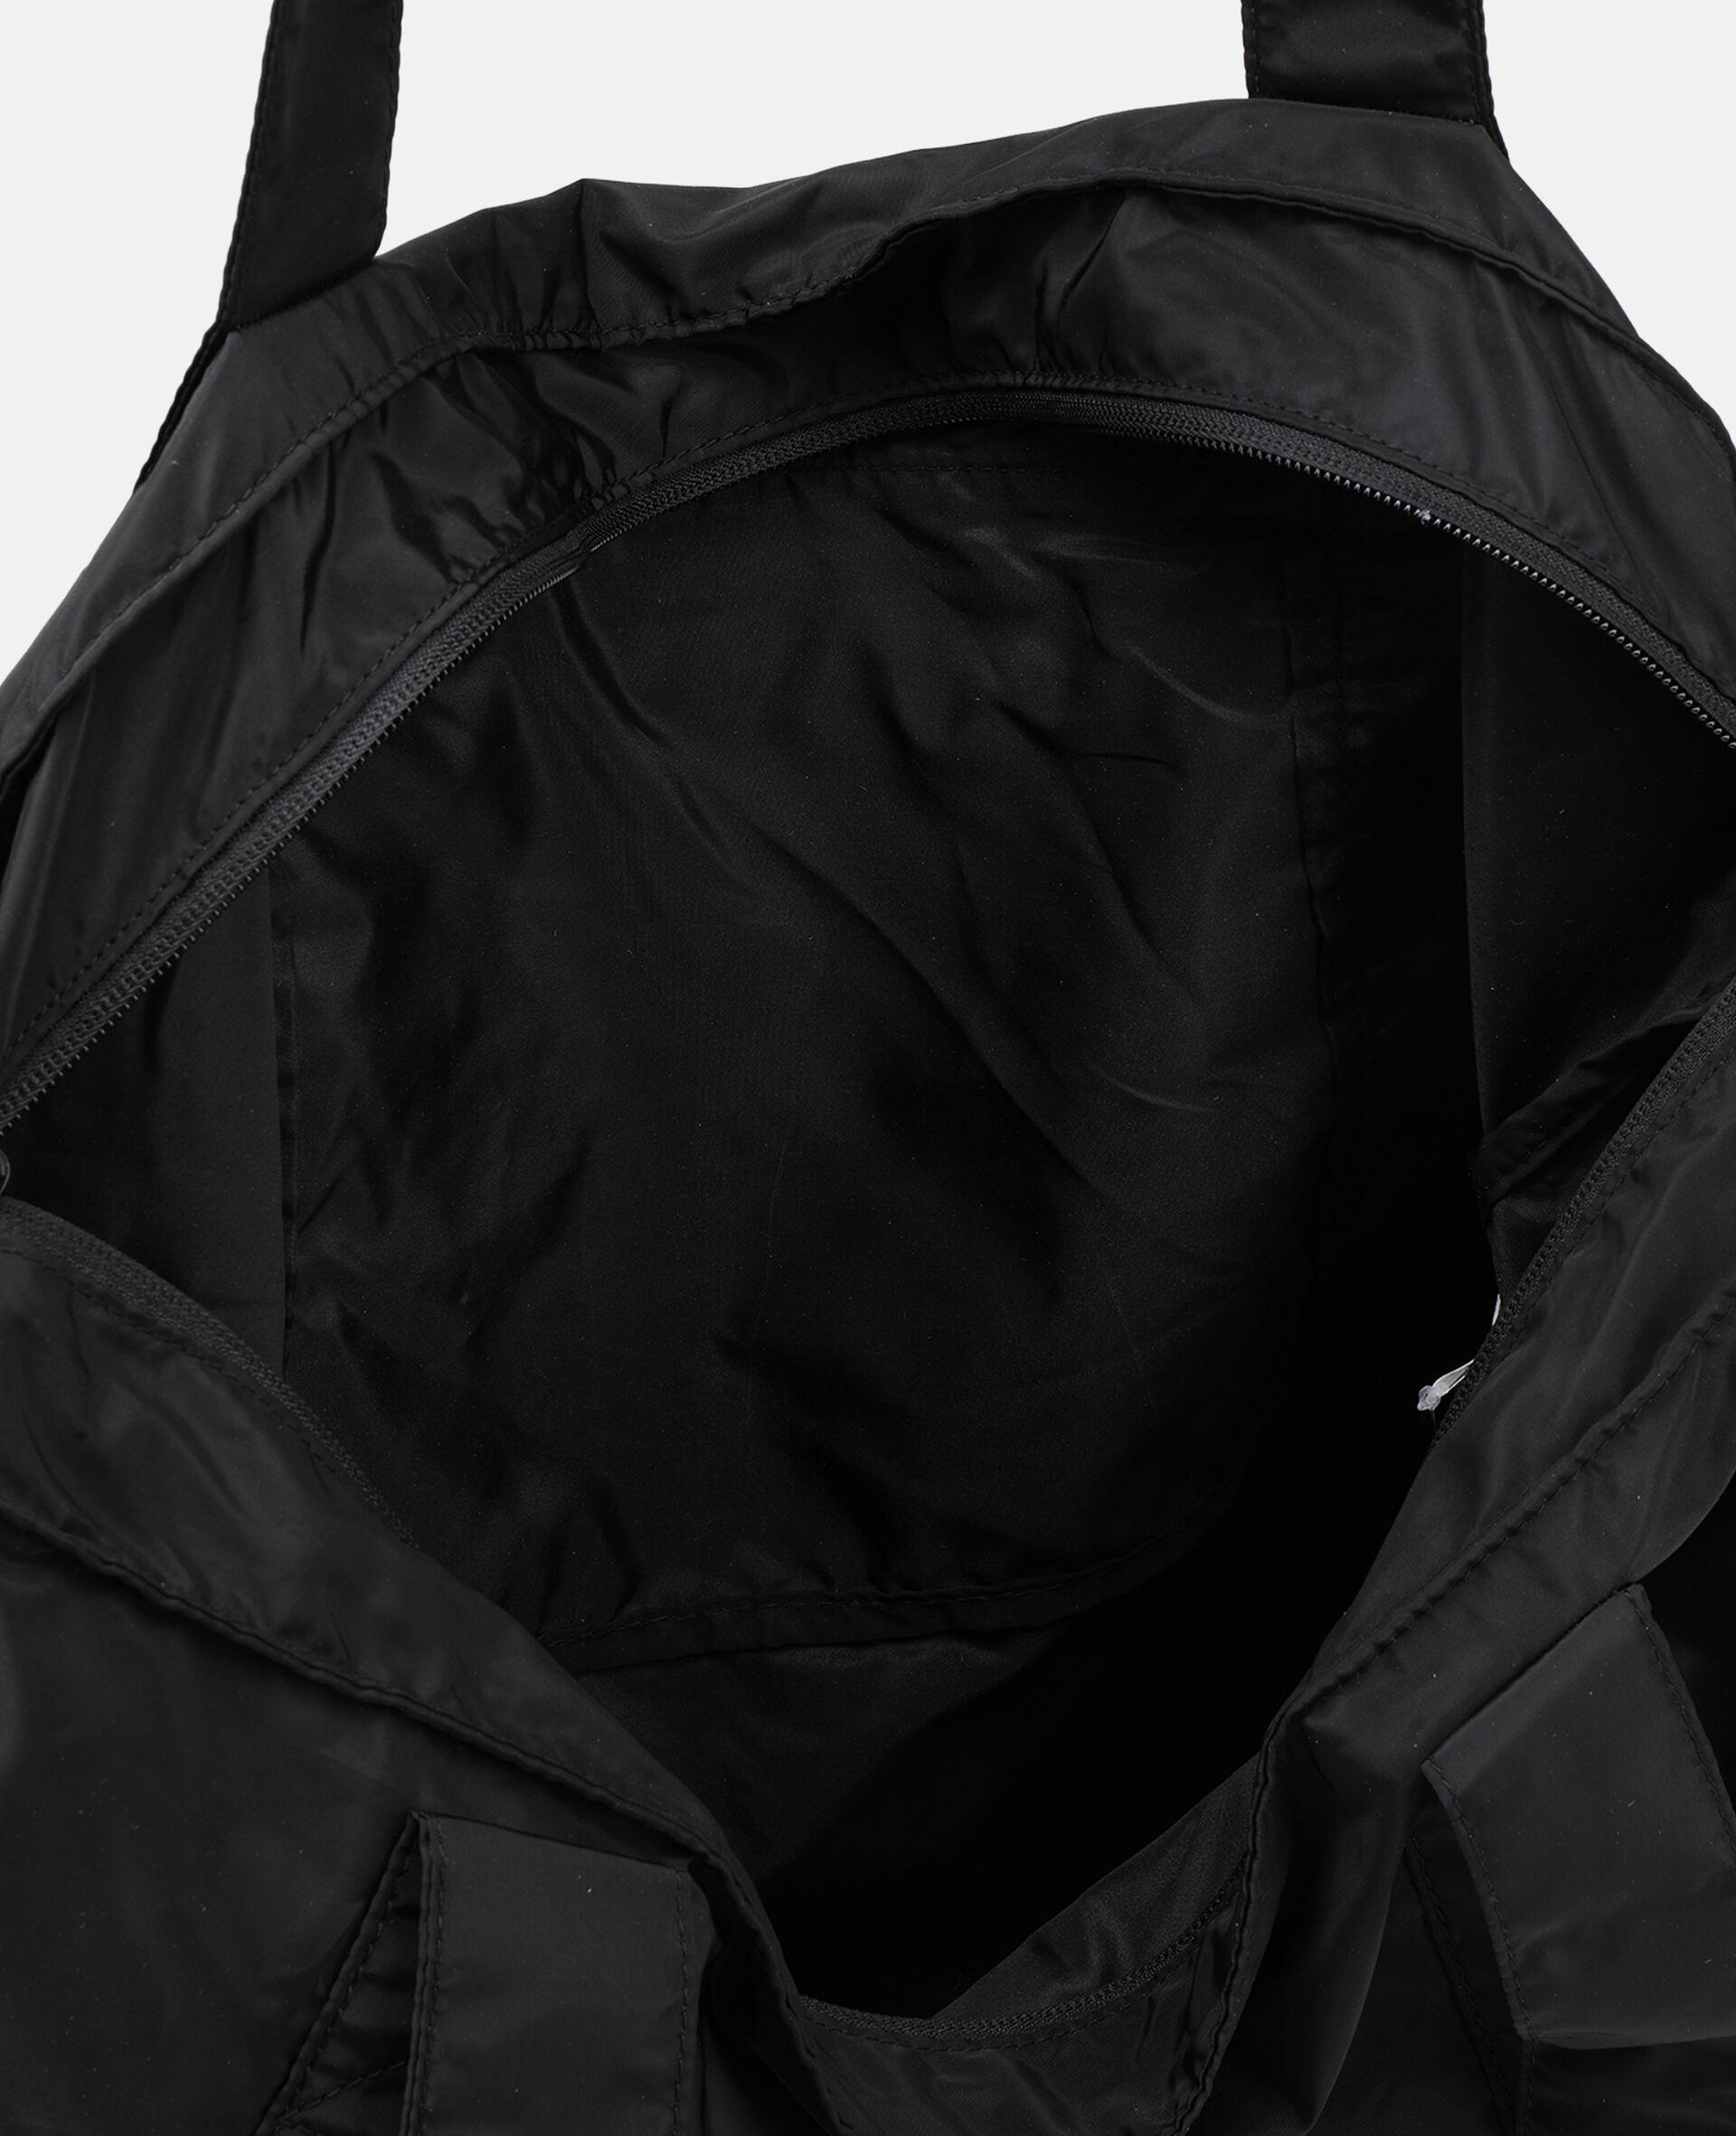 黑色印纹托特包 -黑色-large image number 2